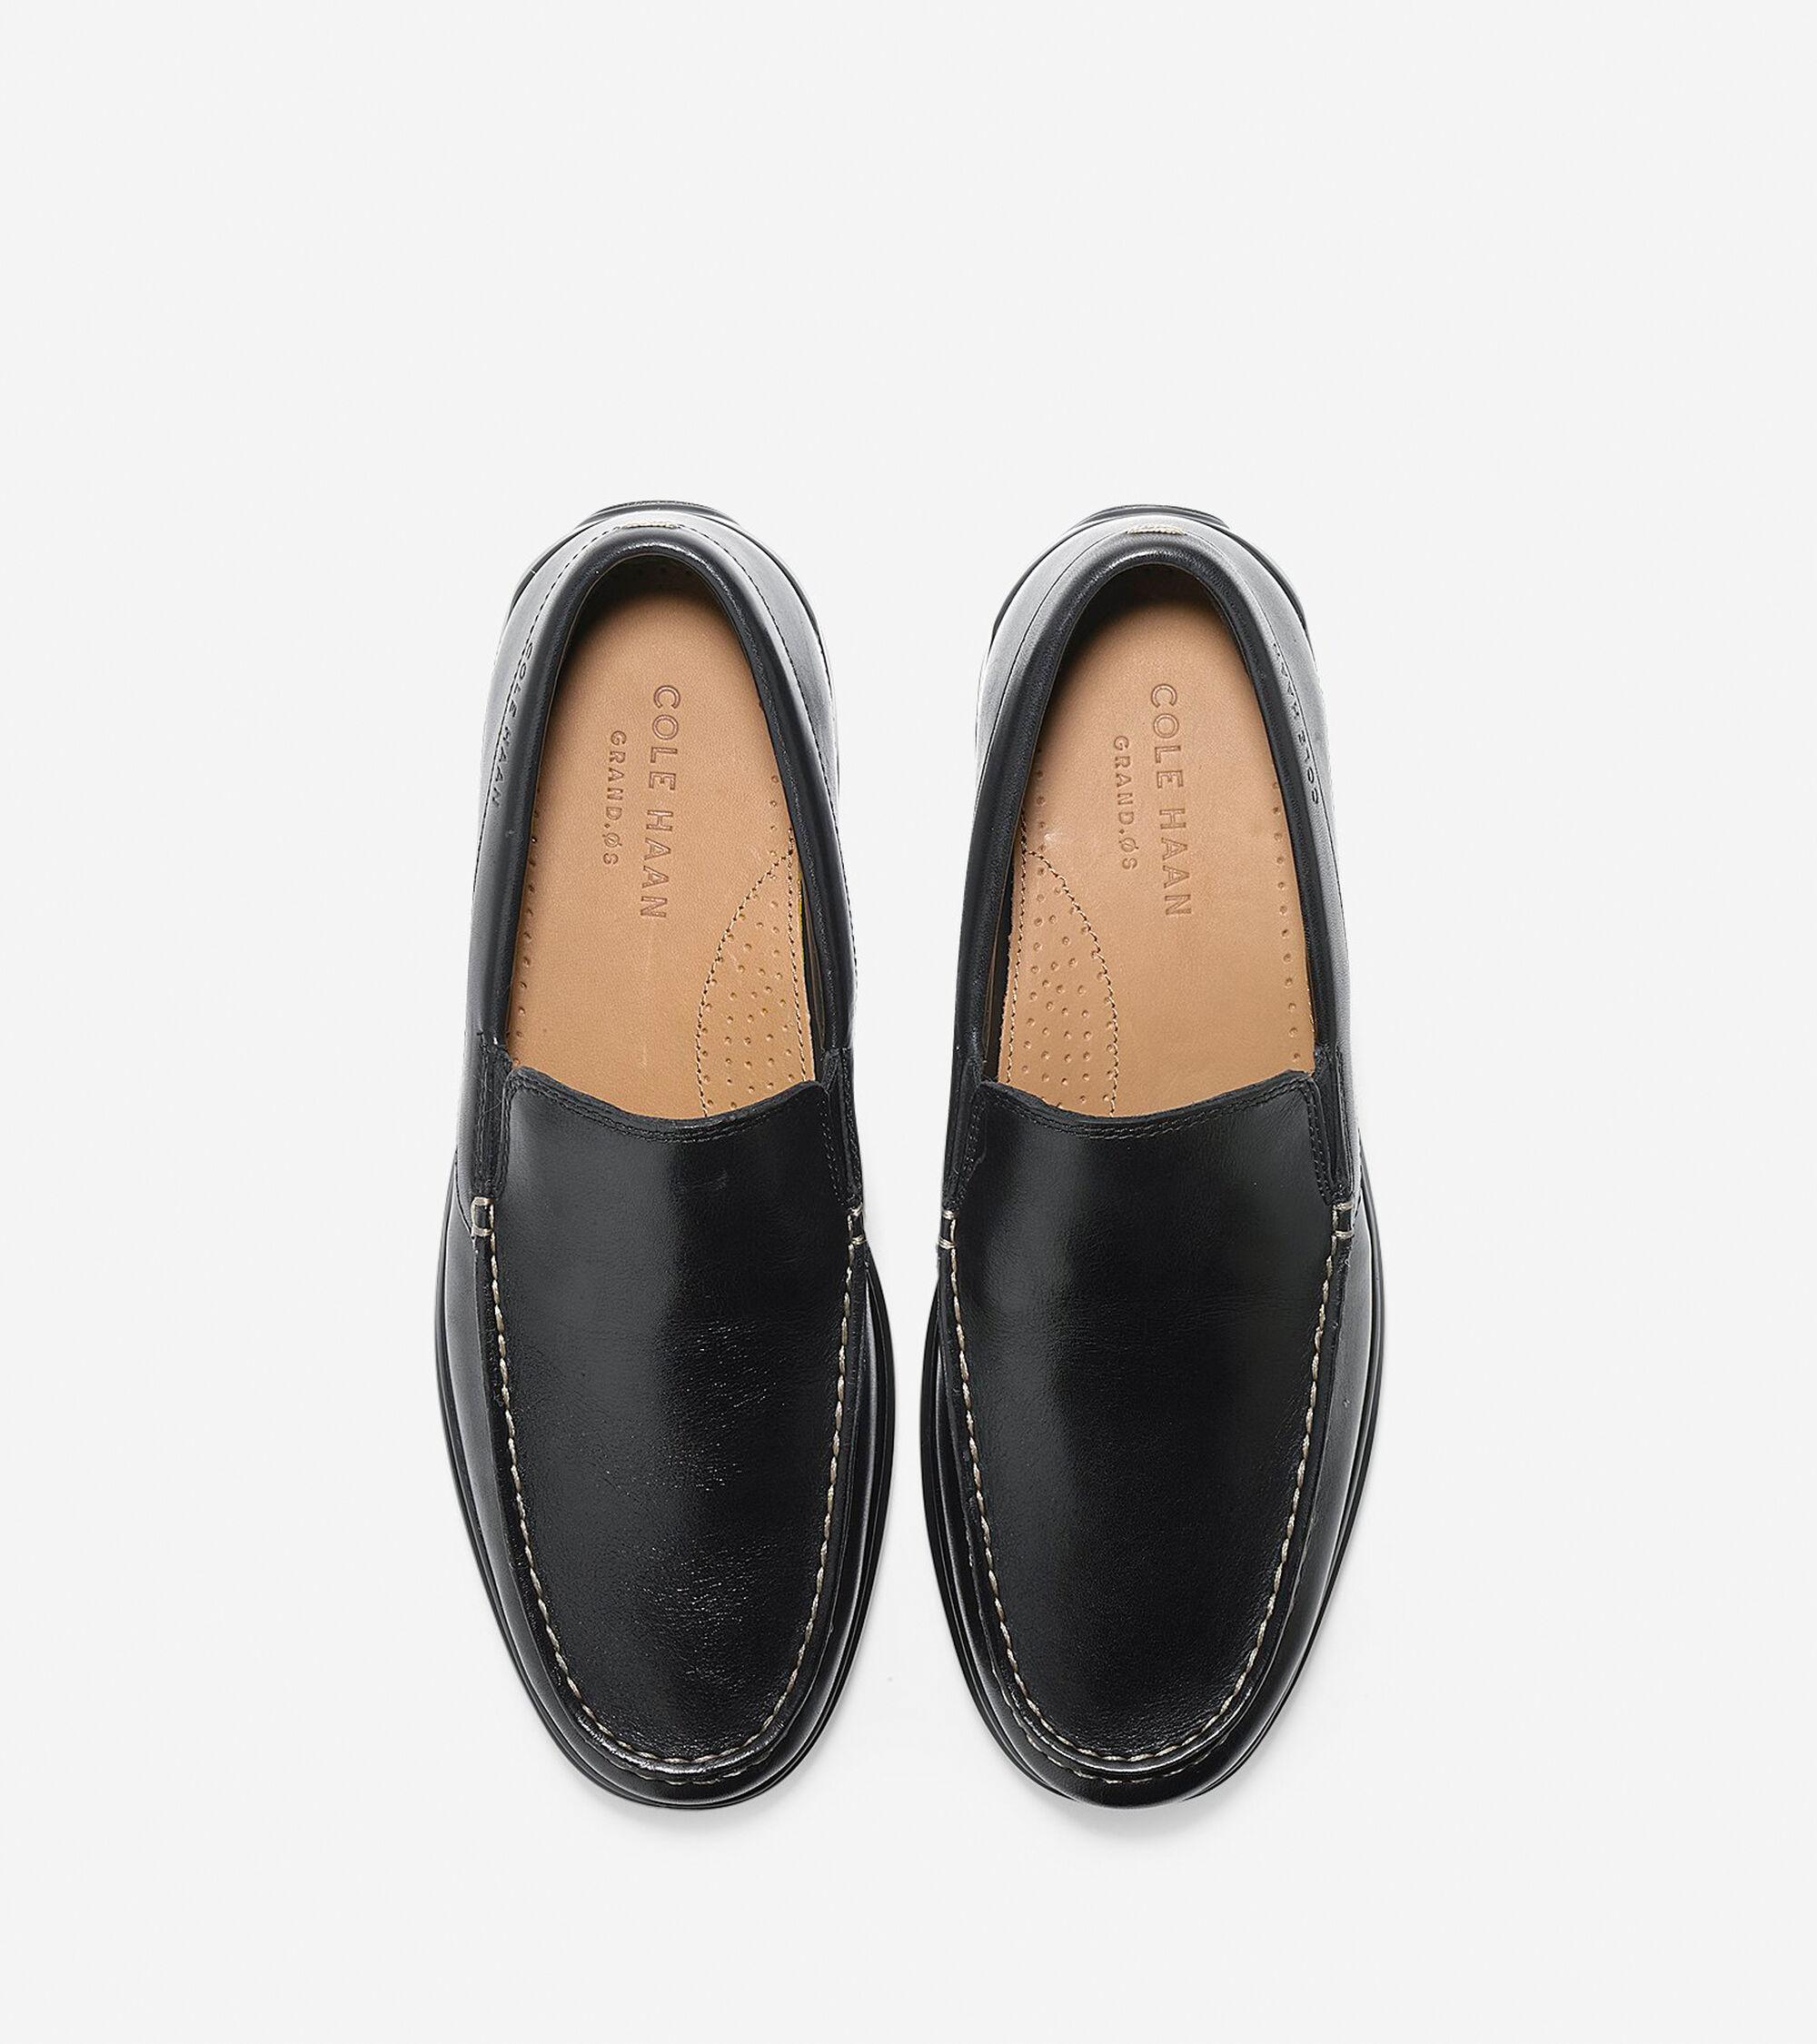 0dde1046eb5 Men s Santa Barbara Twin Gore Loafers in Black